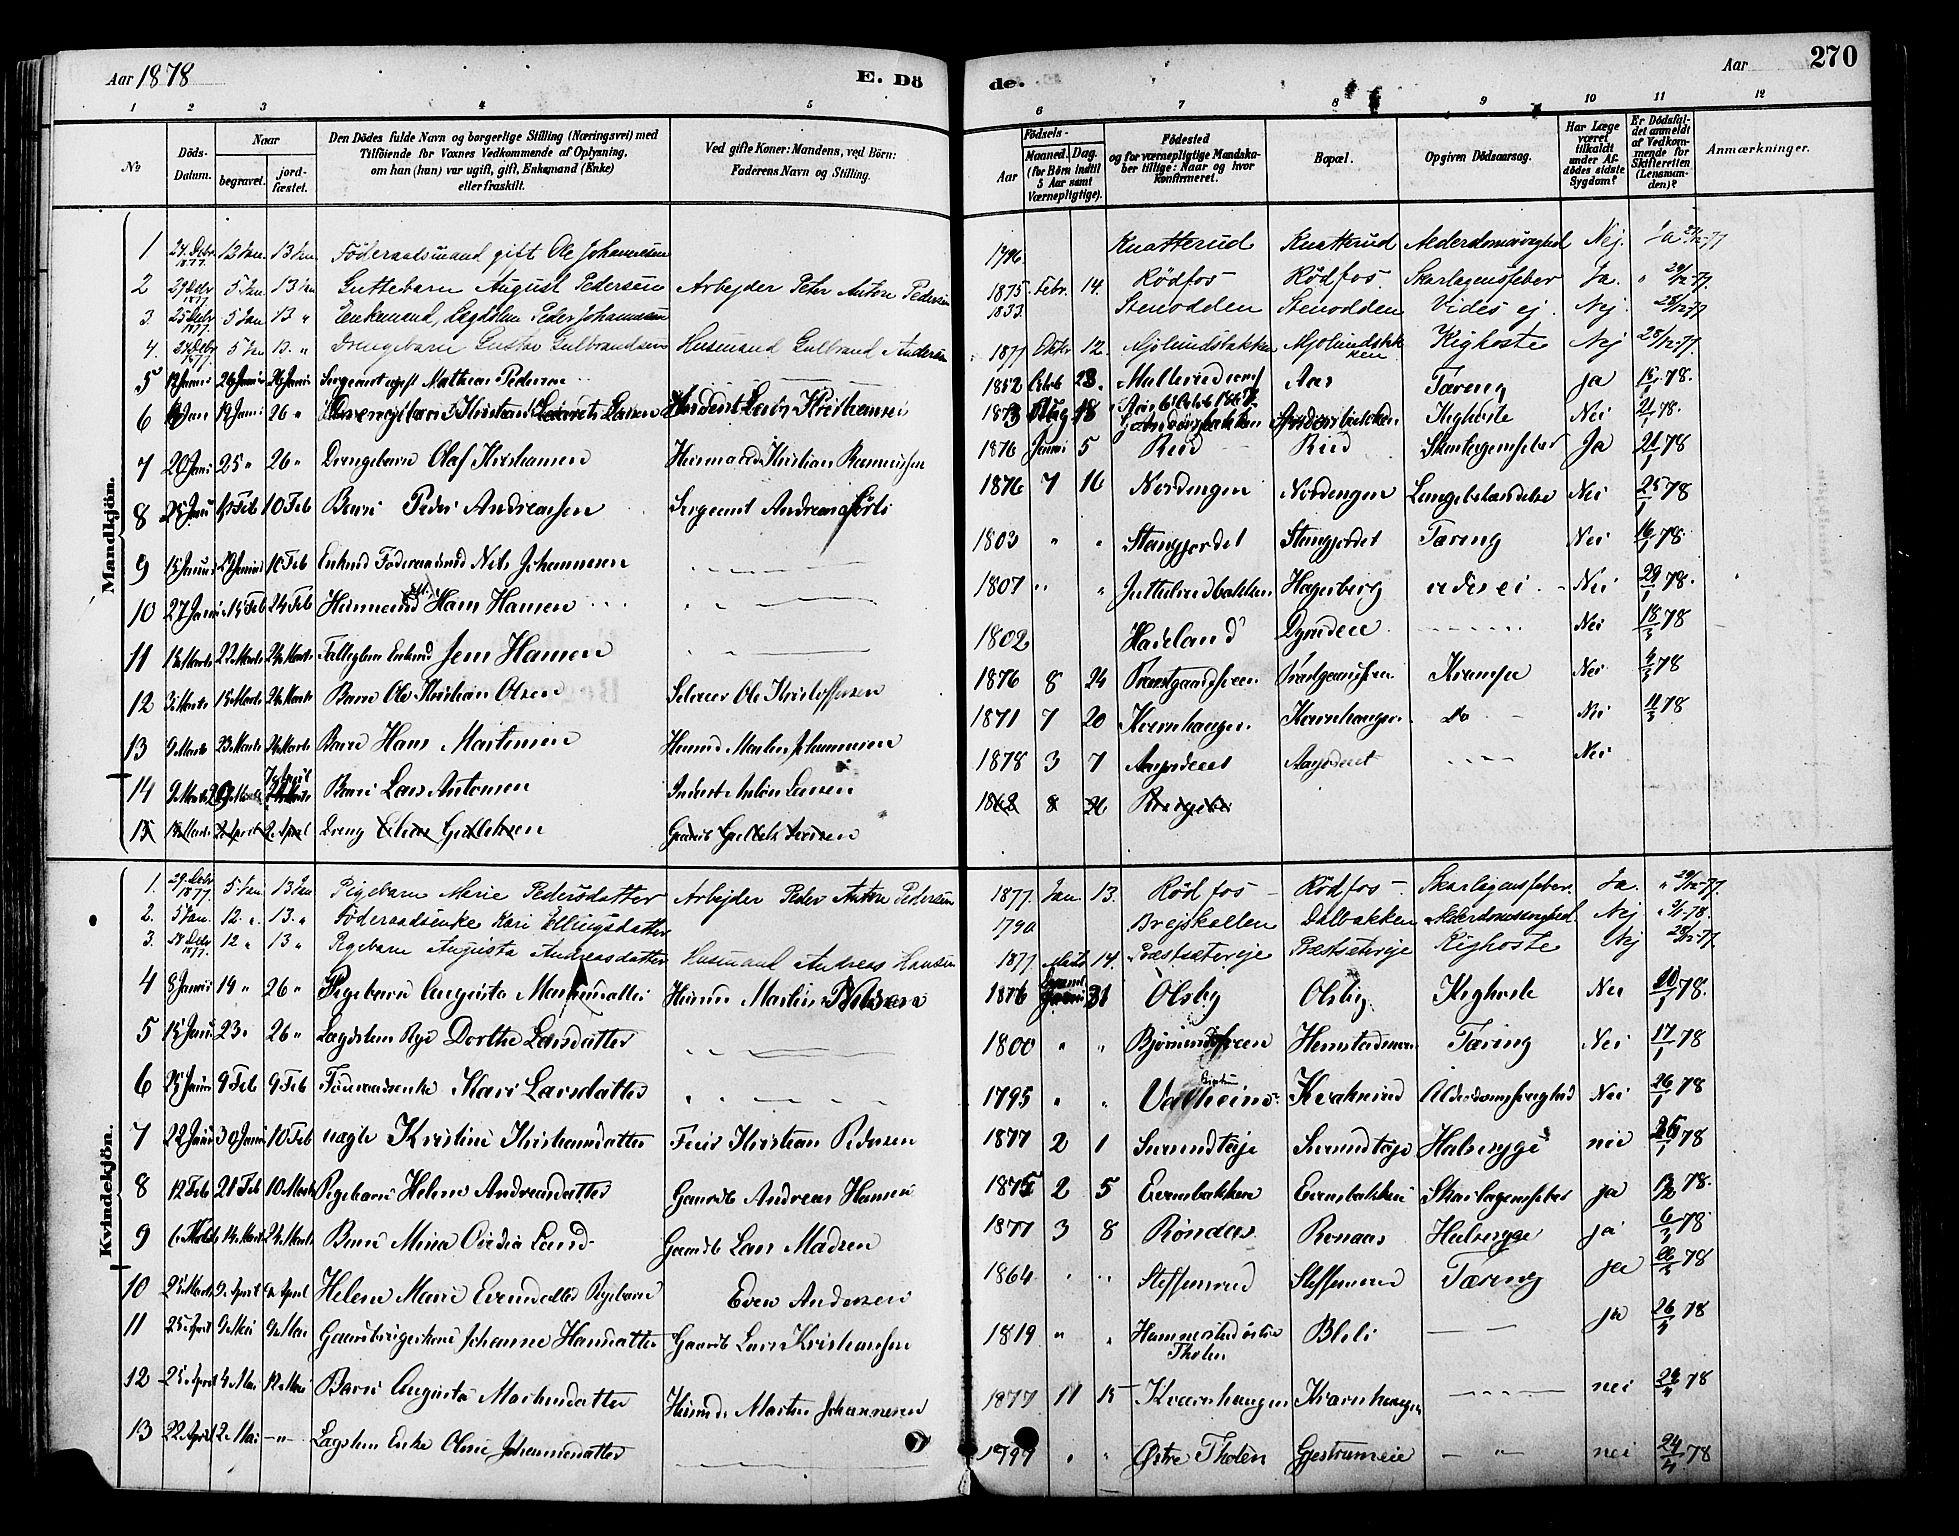 SAH, Vestre Toten prestekontor, H/Ha/Haa/L0009: Ministerialbok nr. 9, 1878-1894, s. 270